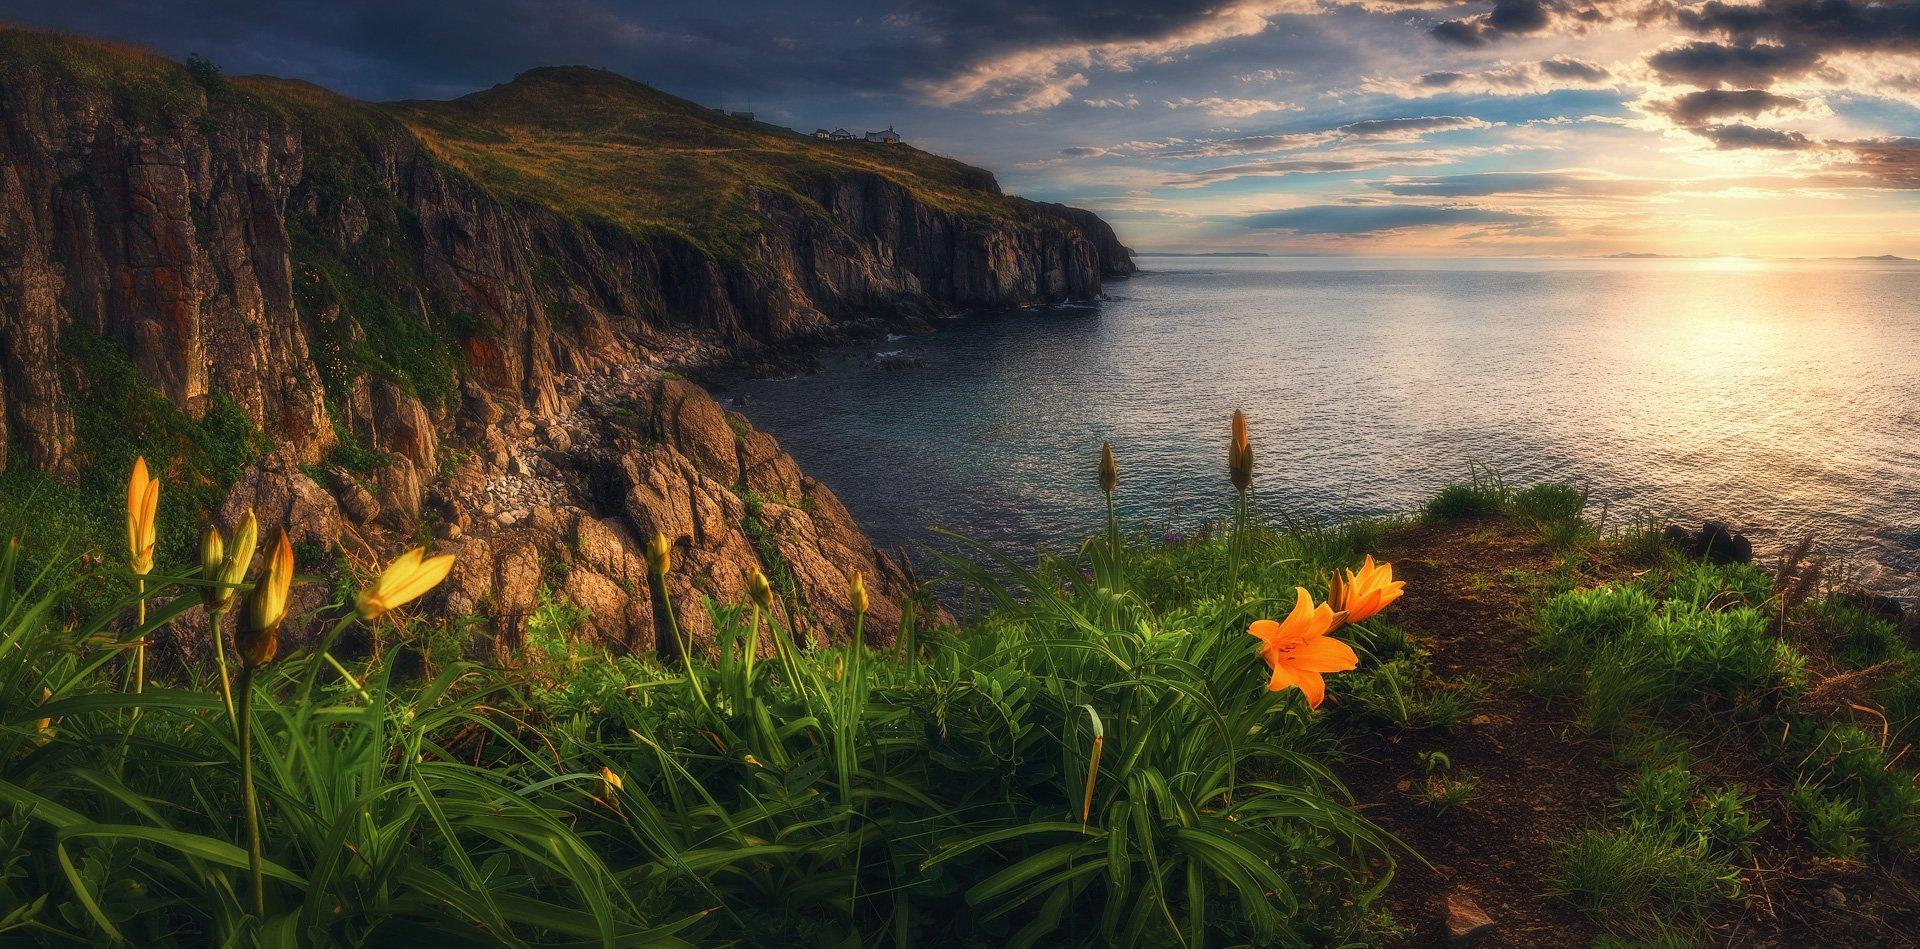 панорама, море, скалы, маяк, утро, лето, Андрей Кровлин